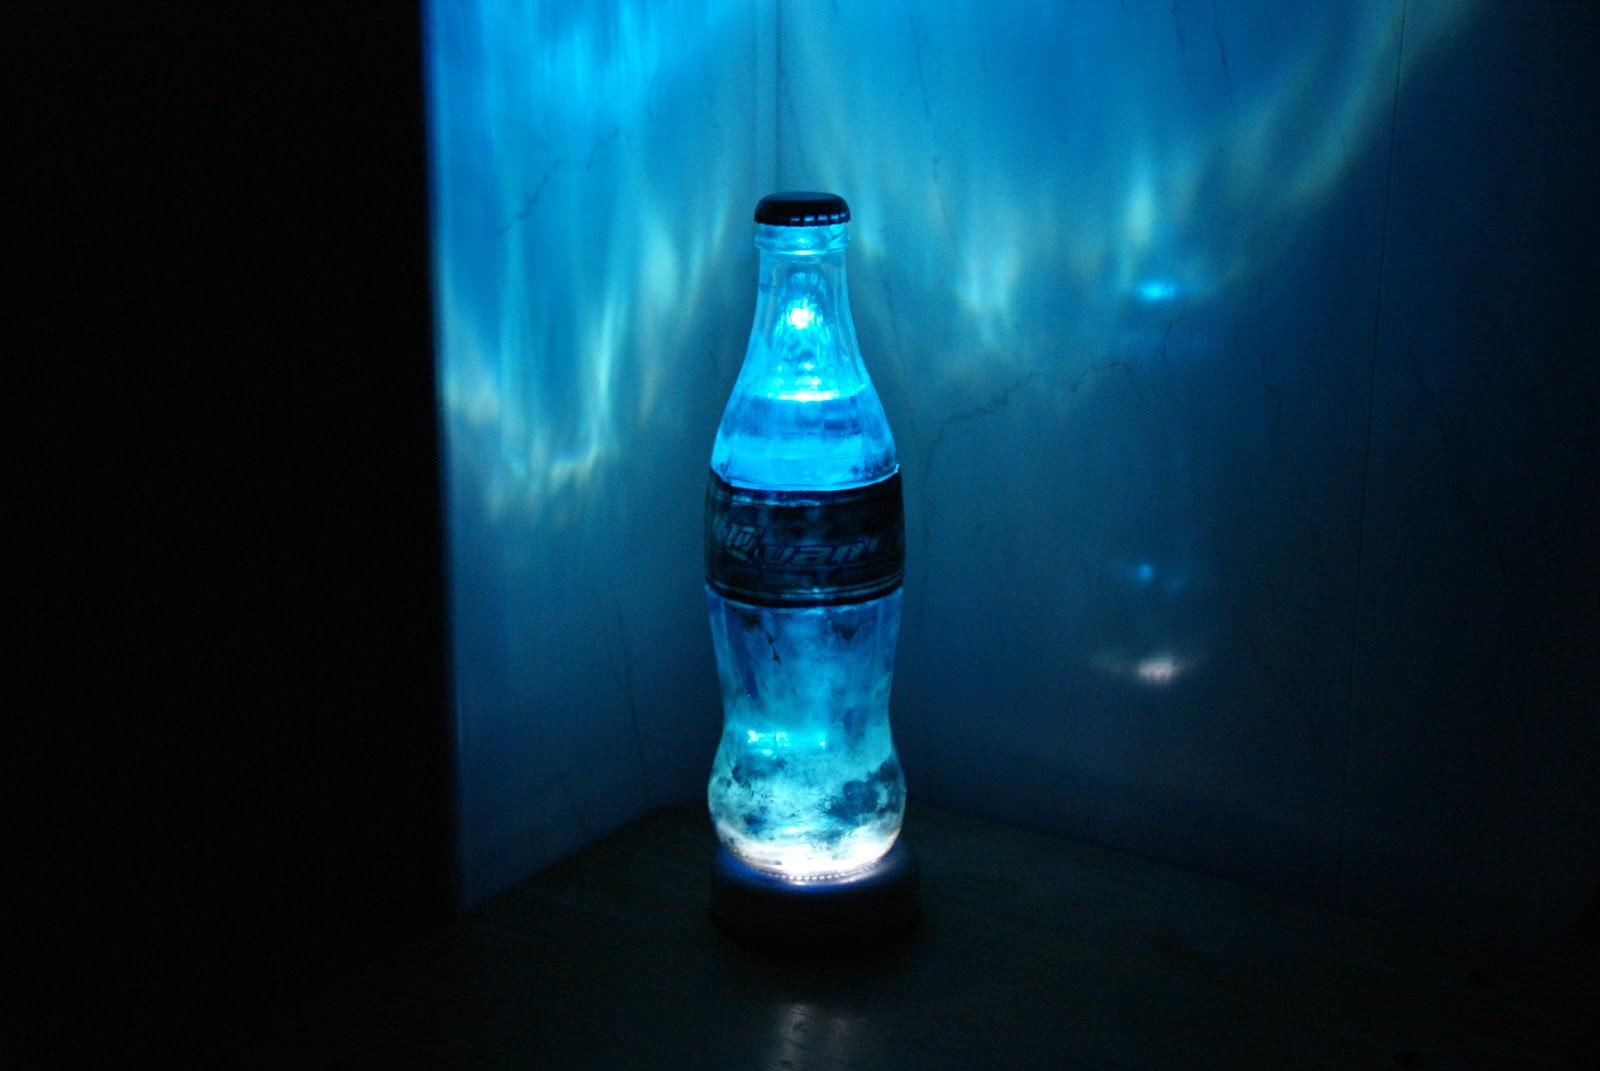 https://www.etsy.com/uk/listing/151370393/fallout-nuka-cola-quantum-quartz-victory